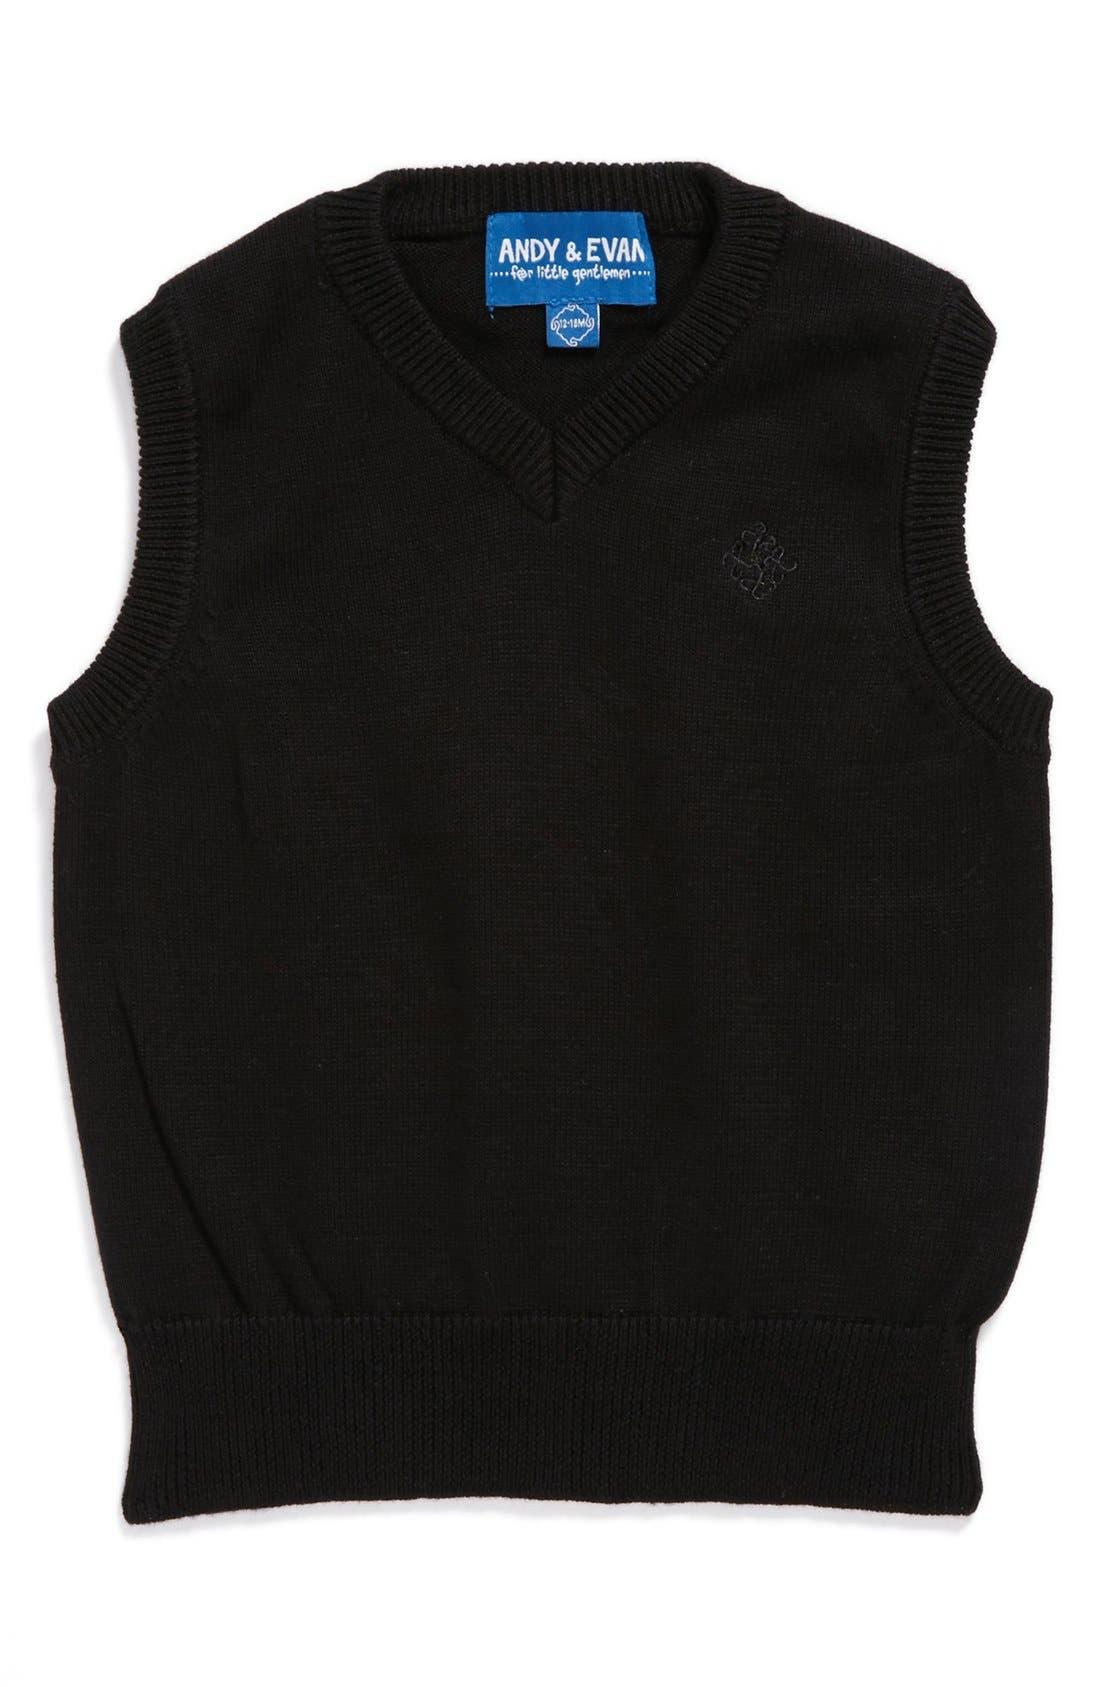 Alternate Image 1 Selected - Andy & Evan for little gentlemen Sweater Vest (Toddler Boys)